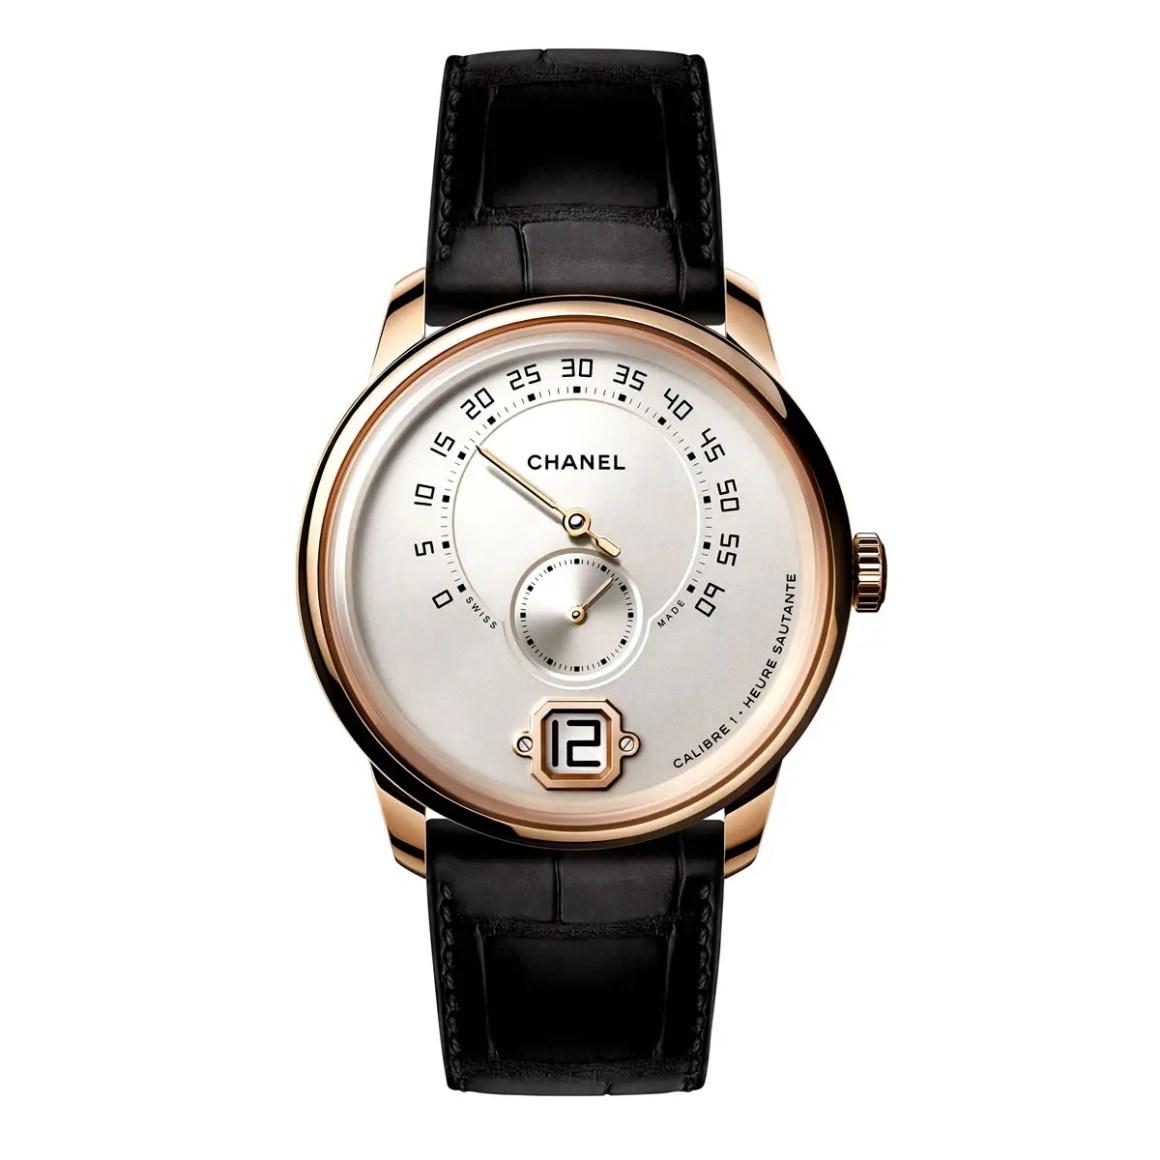 Chanel Monsieur Men's Fashion Watch